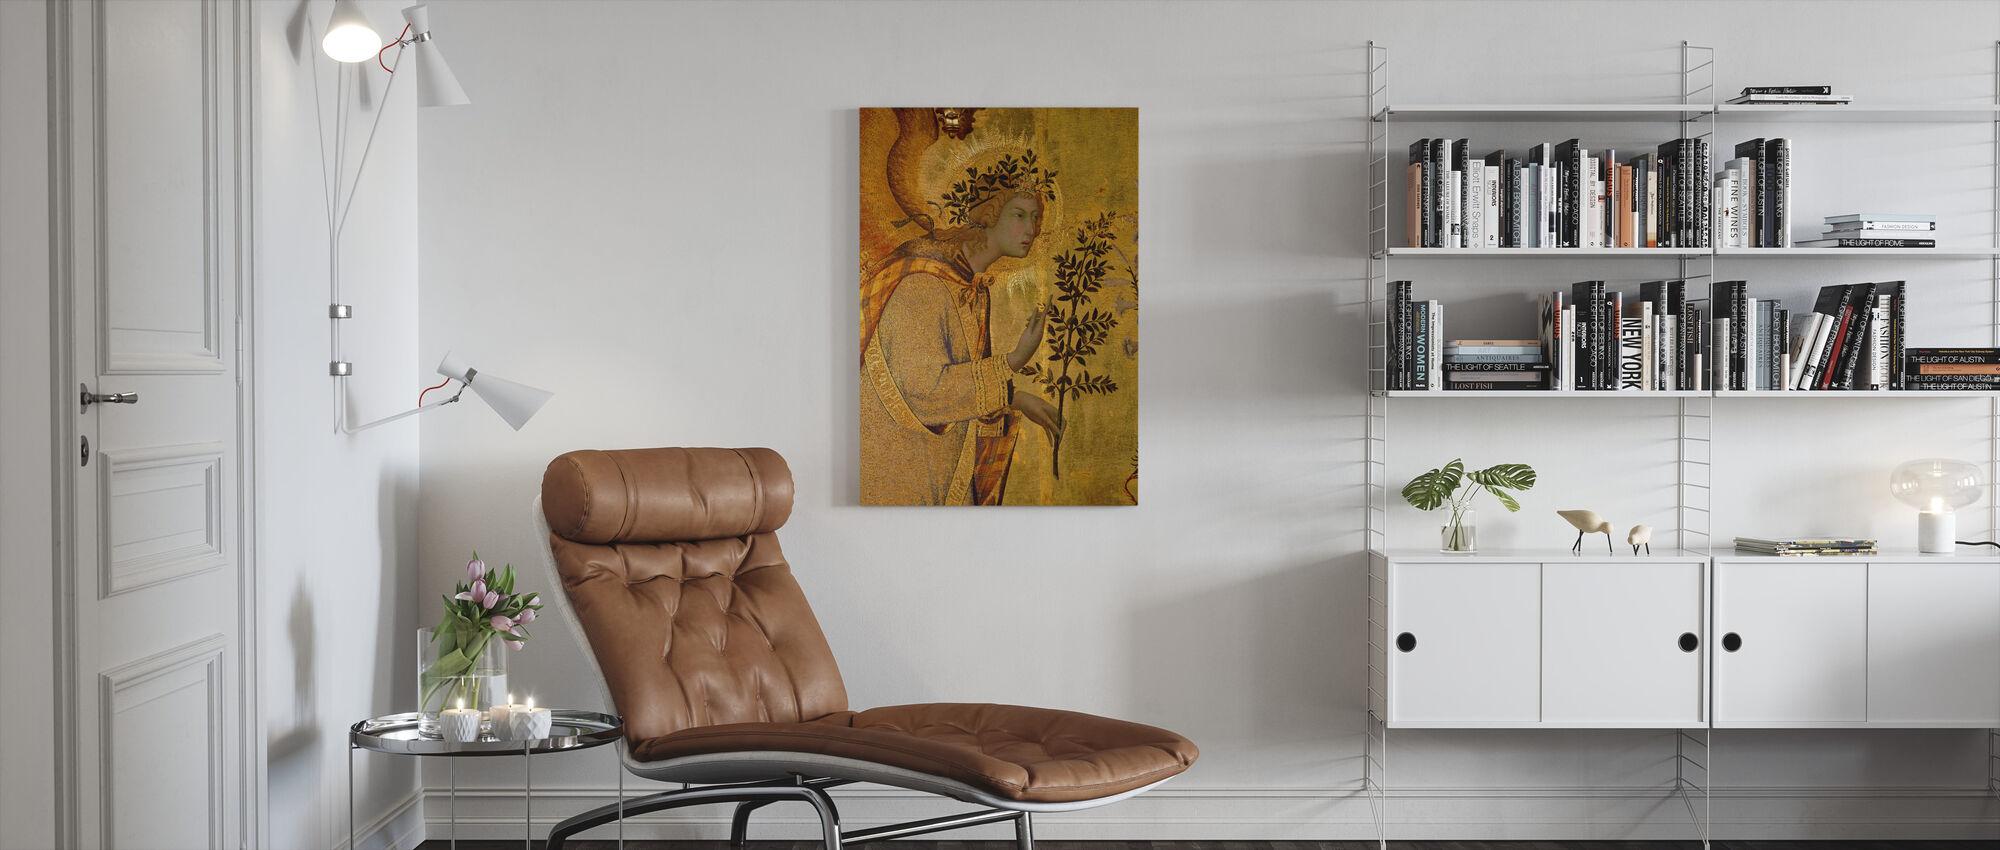 Verkündigung Detail Der Engel der Verkündigung - Leinwandbild - Wohnzimmer